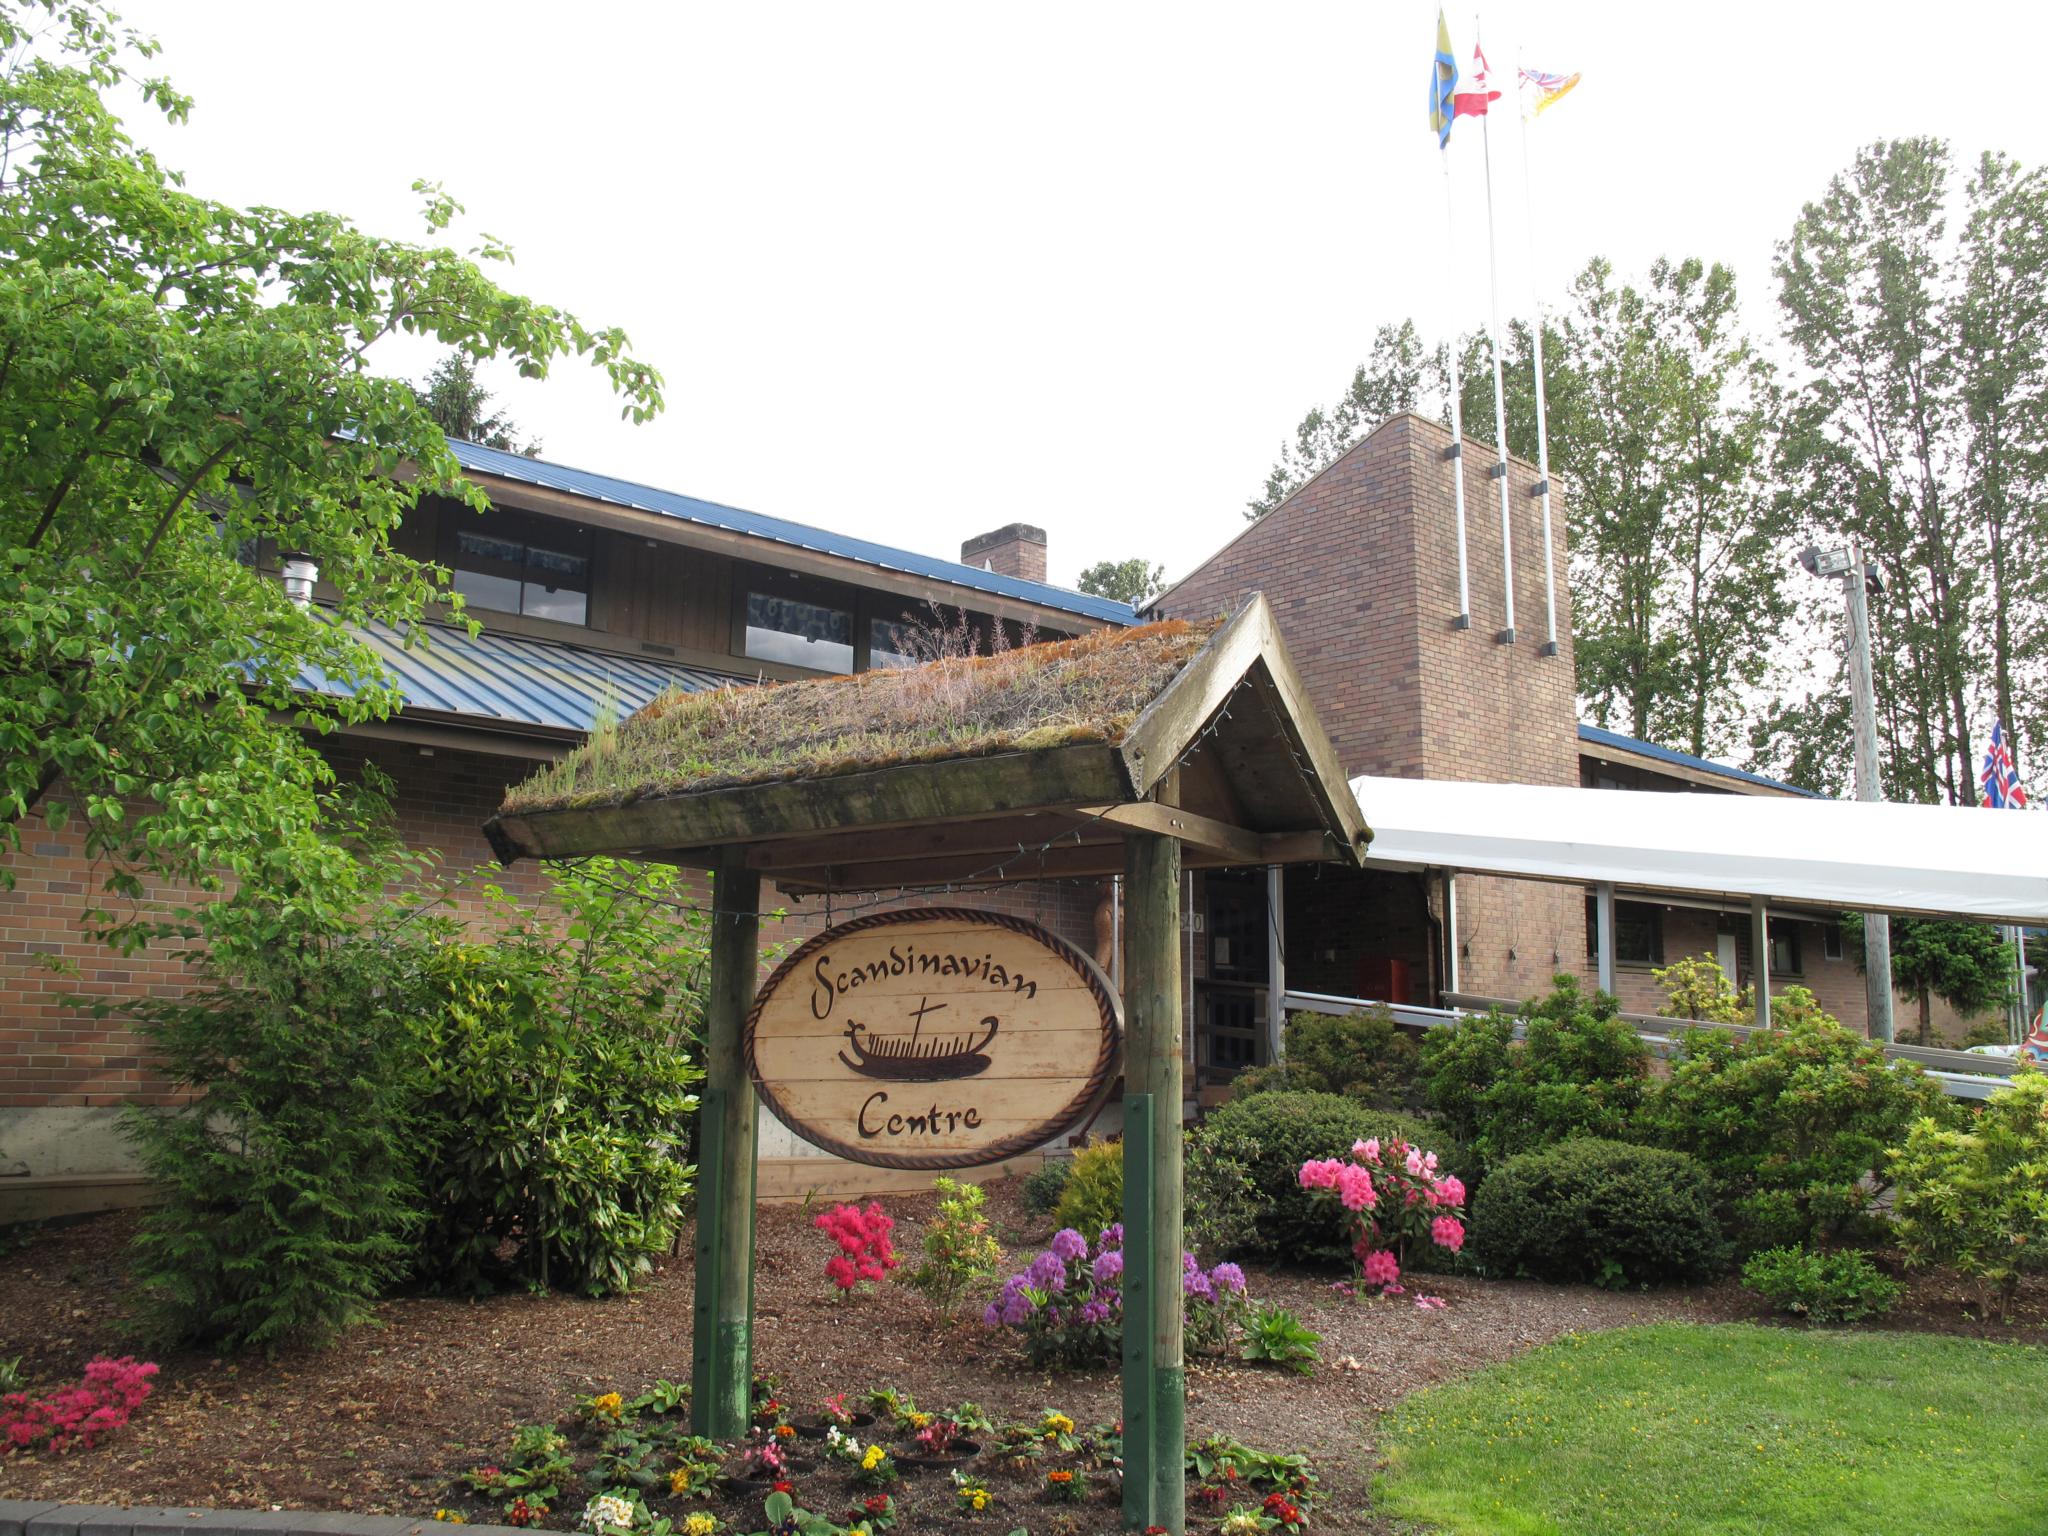 Scandinavian Community Centre